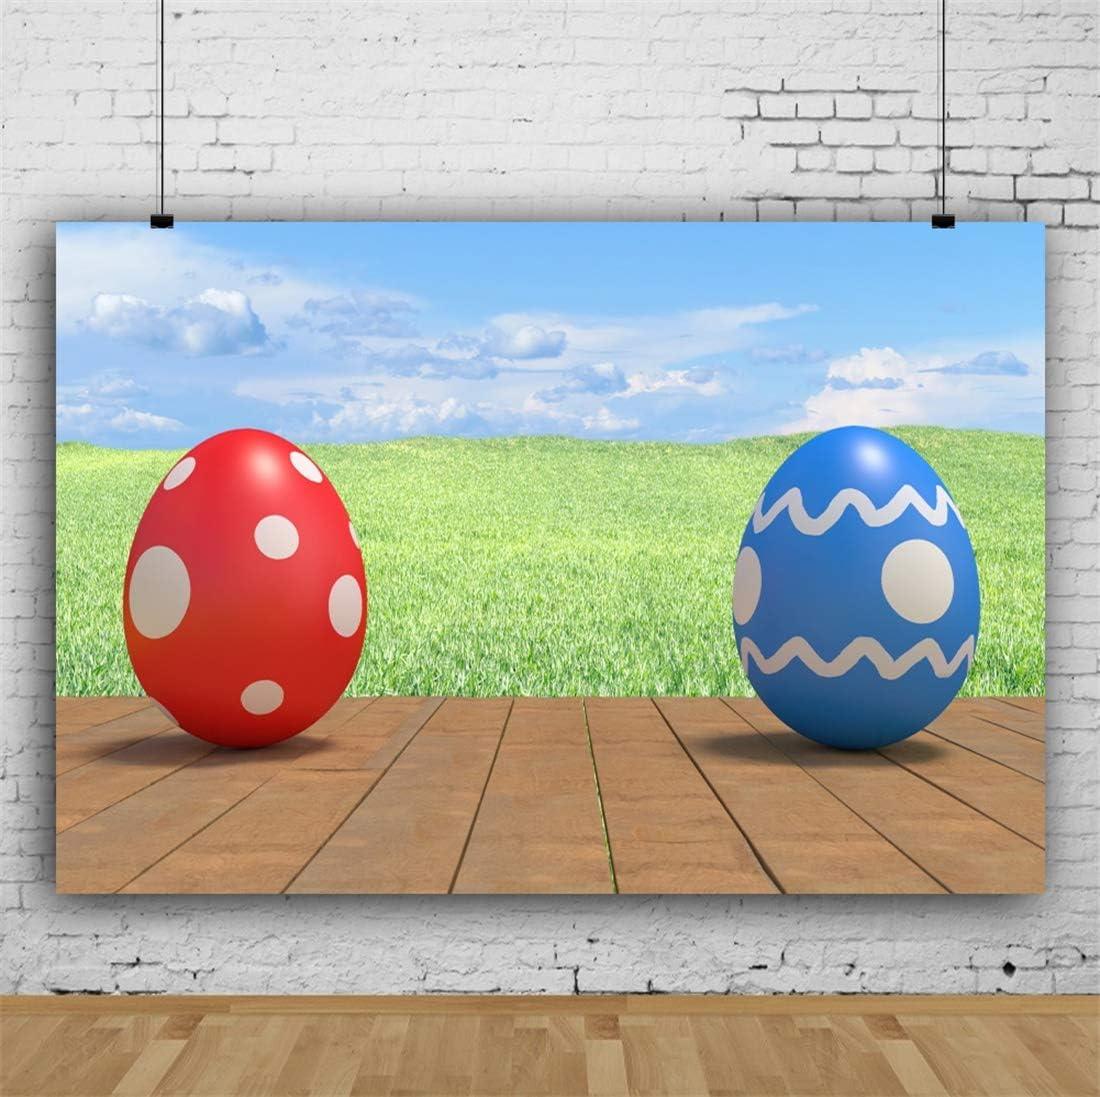 Yeele-Easter-Backdrop 6x4ft Easter Photography Background Eggs Blue Sky Grassland Brown Wooden Floor Sunshine Photo Backdrops Pictures Studio Props Wallpaper